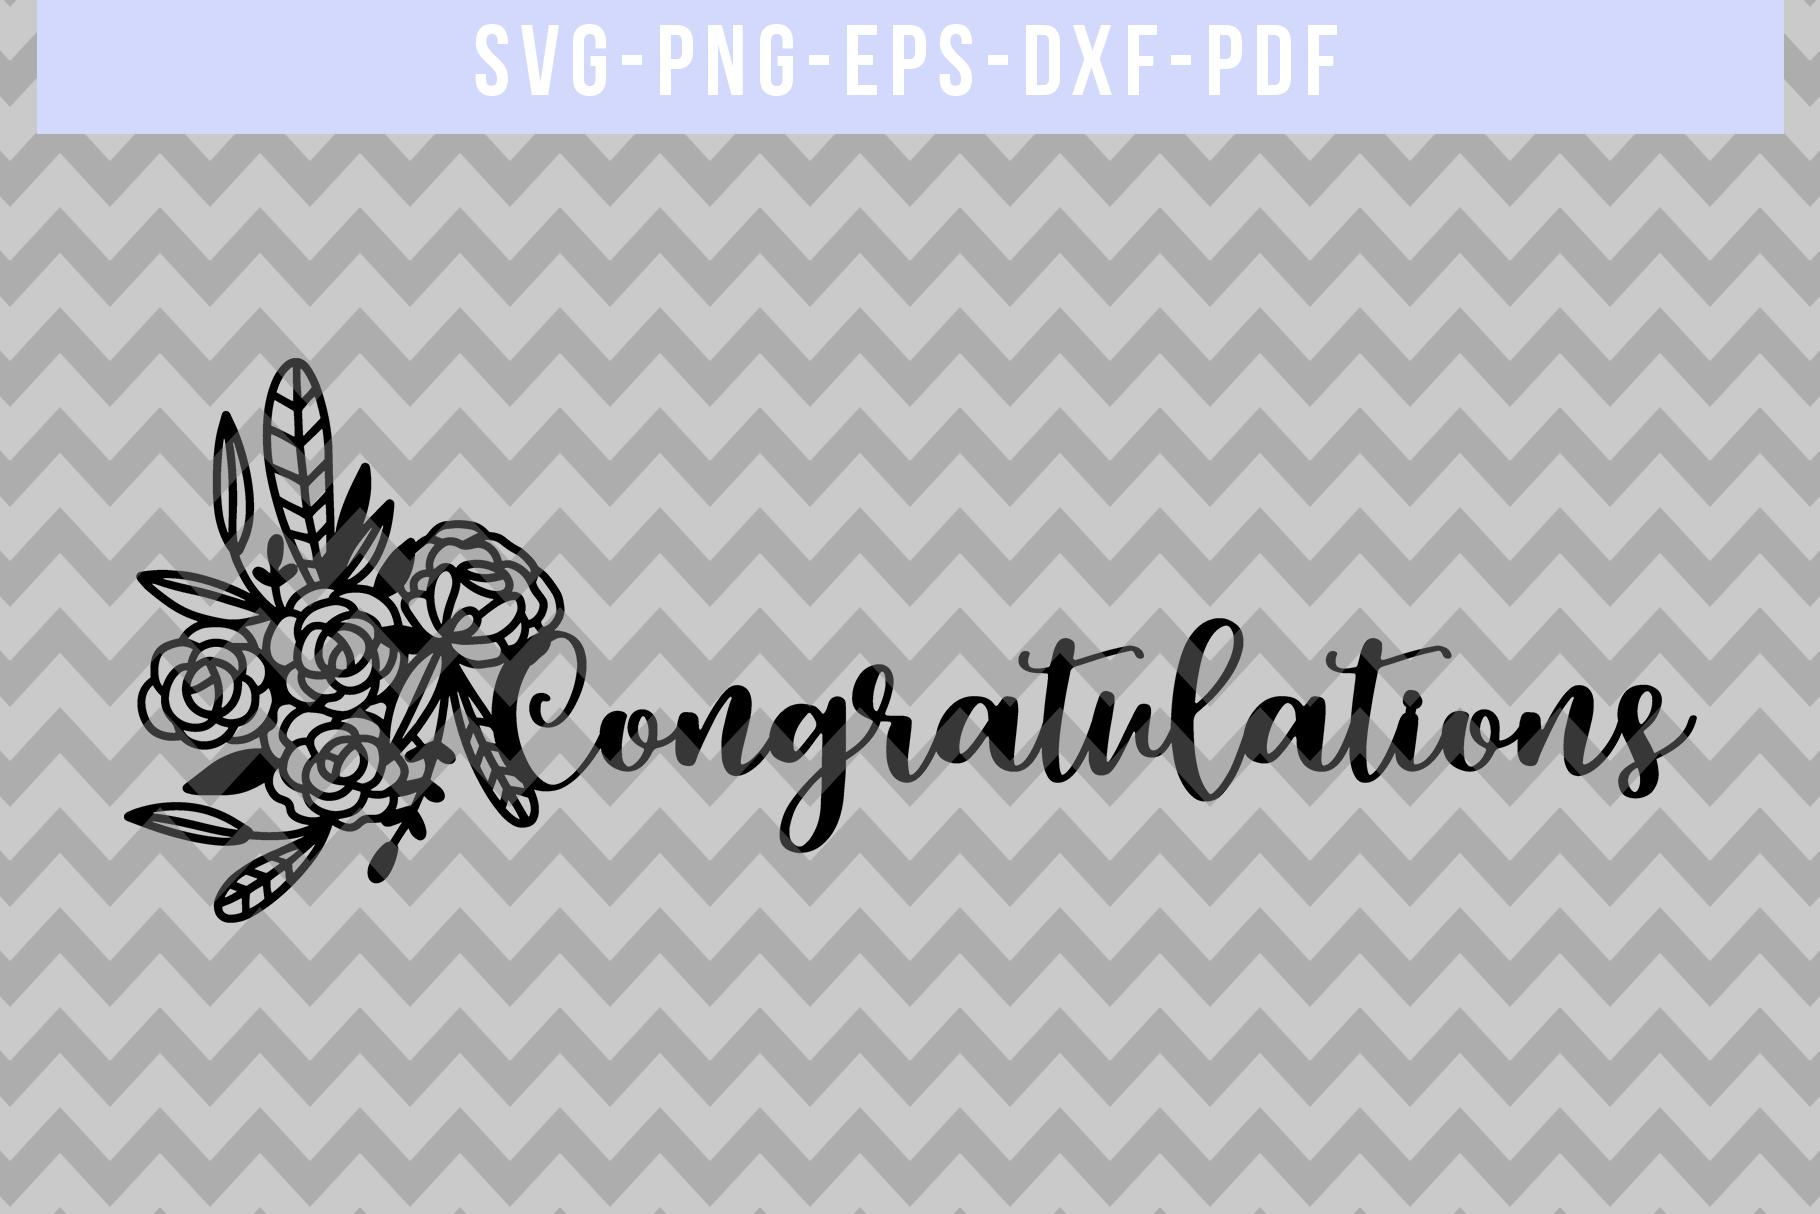 Congratulations Papercut Template, Wedding Cut File, SVG PDF example image 4